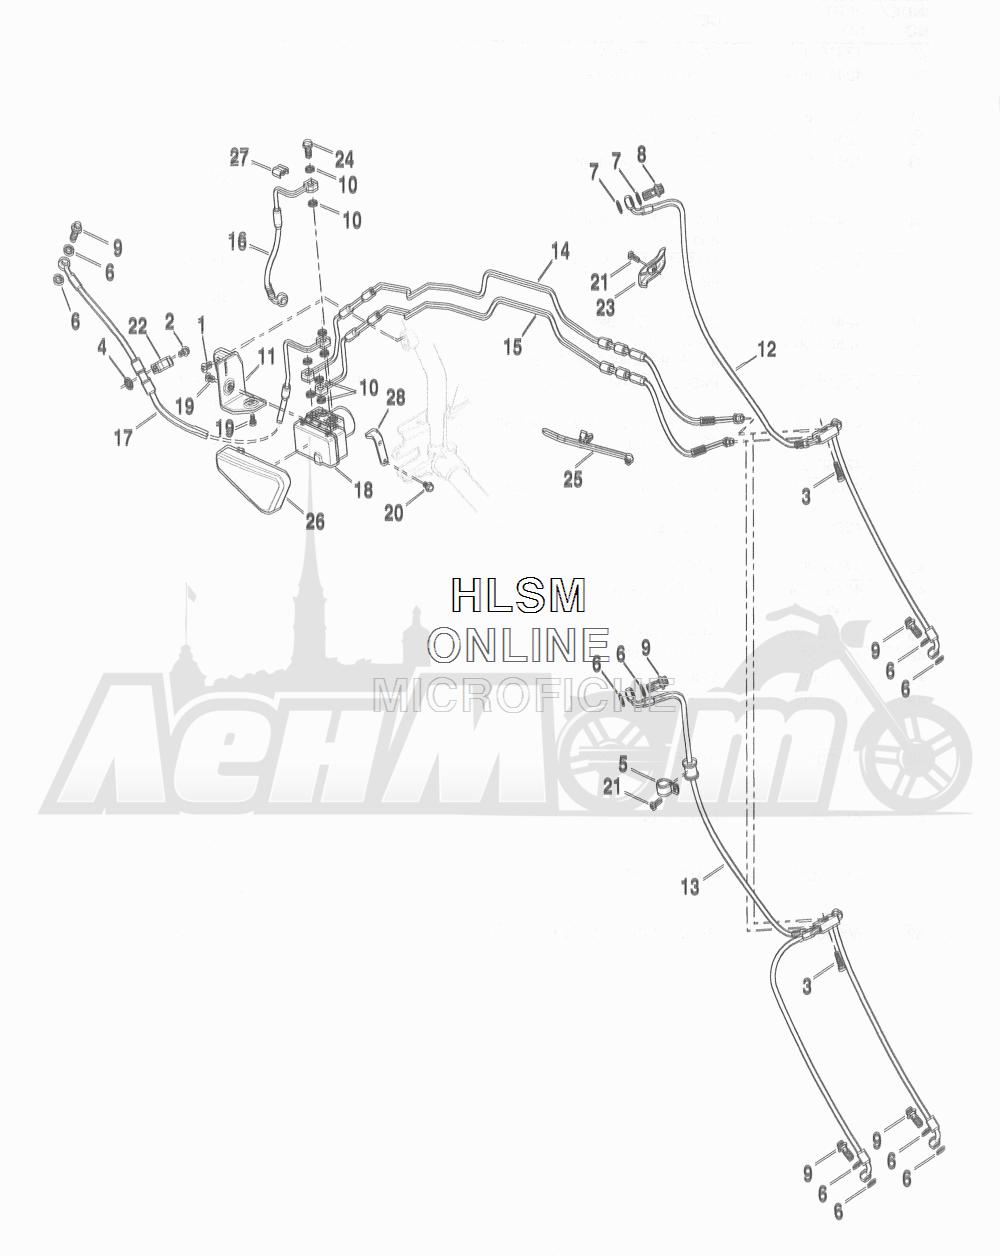 Запчасти для Мотоцикла Harley-Davidson 2016 FLD DYNA 103 SWITCHBACK (GZM) Раздел: BRAKE - W/ MODULE AND LINES (ABS) | тормоза вместе с модуль и магистрали (ABS)